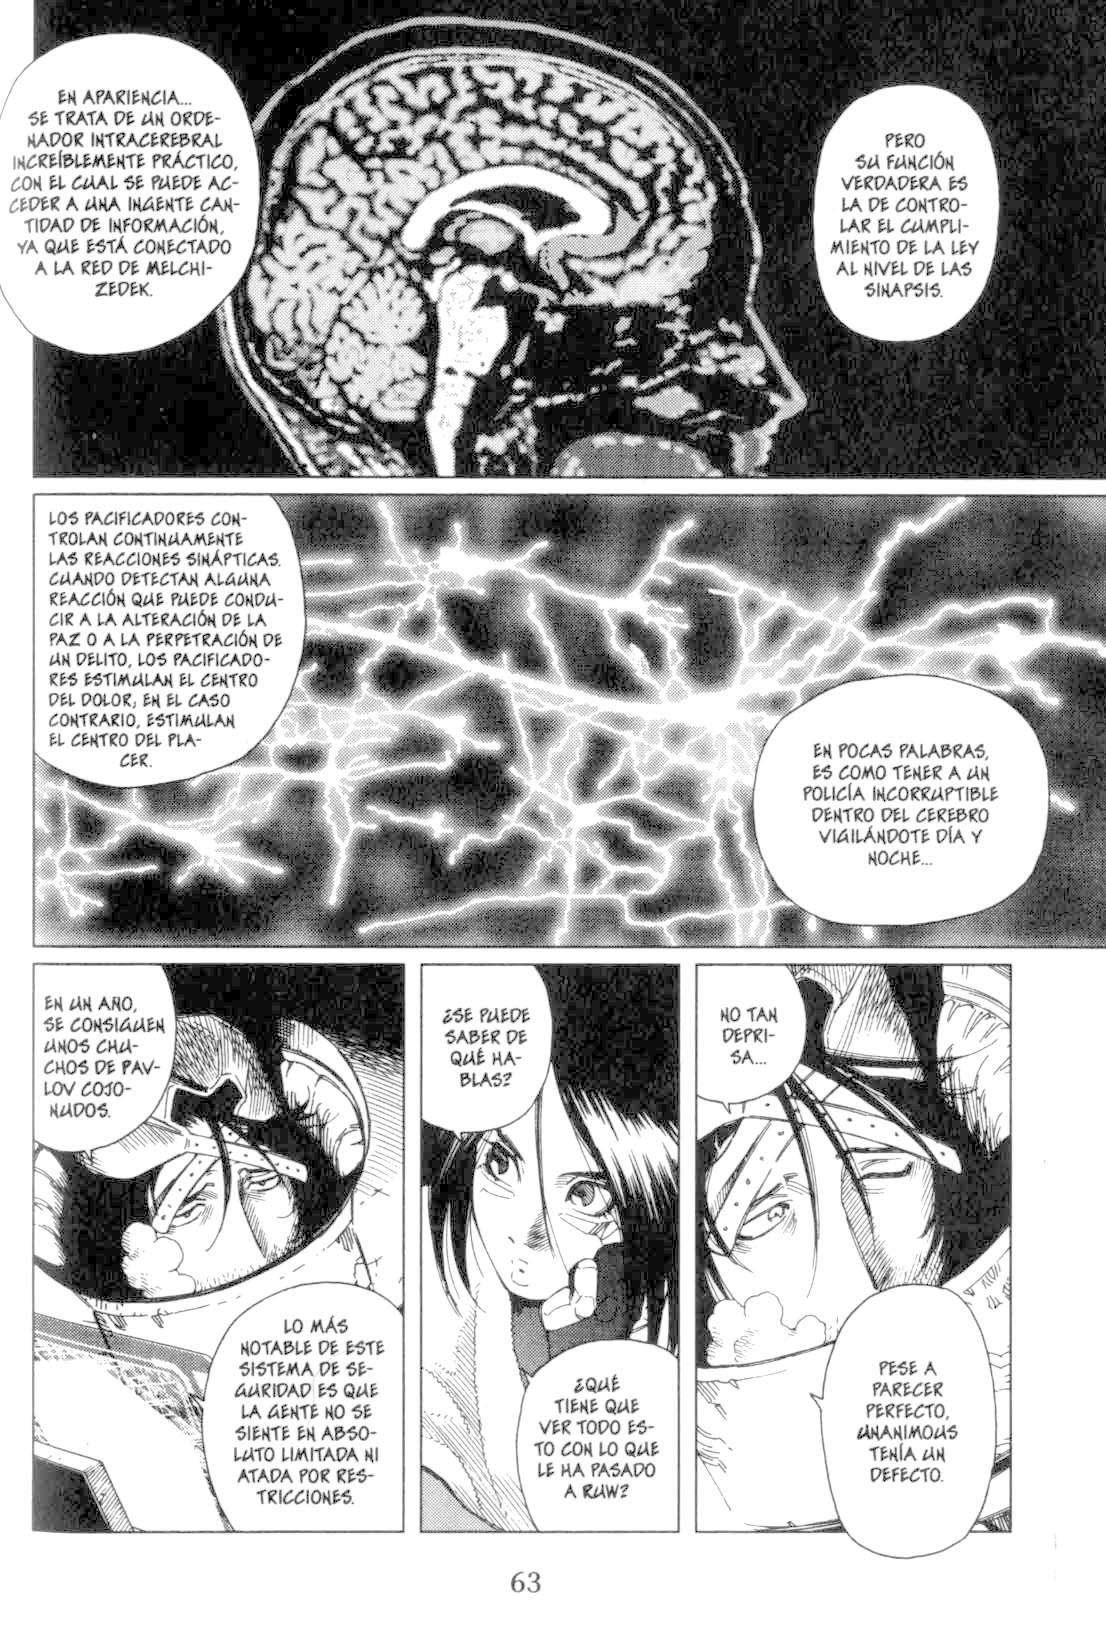 http://c5.ninemanga.com/es_manga/pic2/1/15873/523542/324bacc7aab550b824bbd20d352cbff4.jpg Page 5